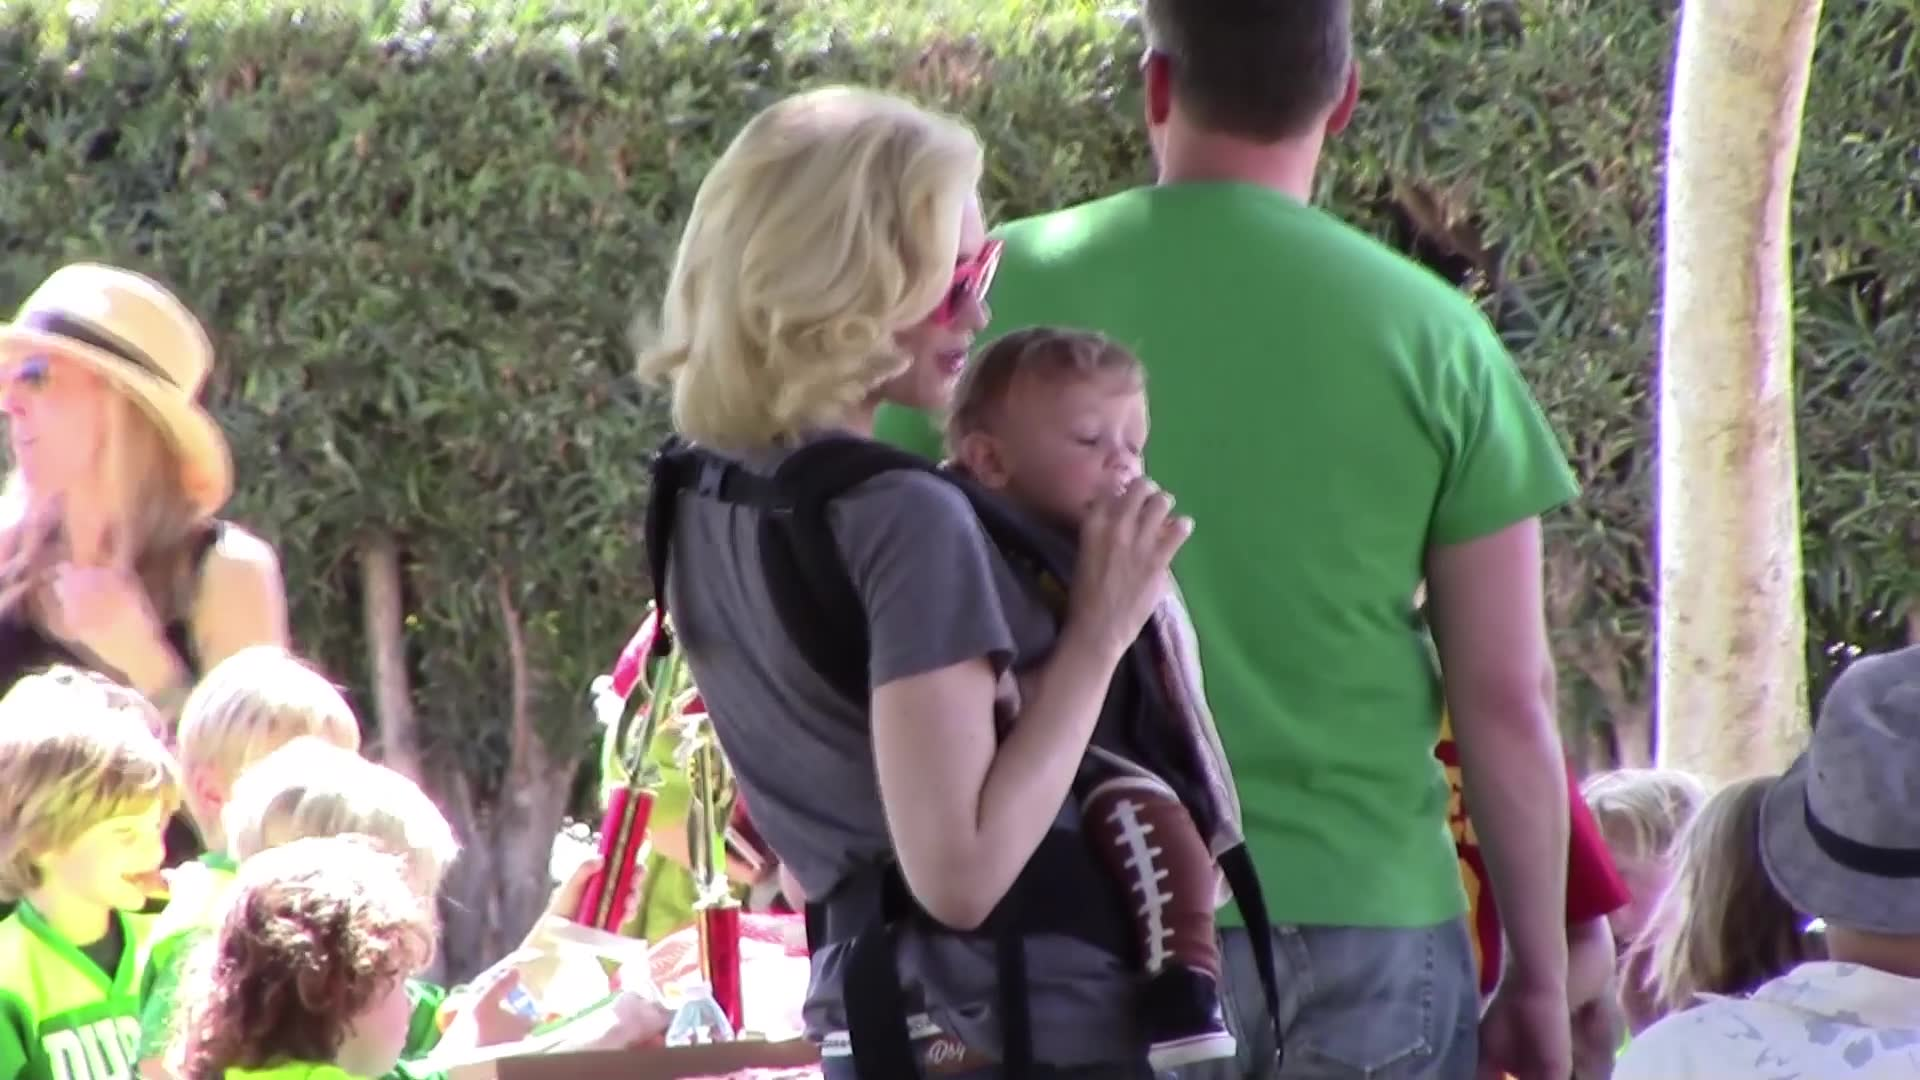 Gwen Stefani and Gavin Rossdale Make Kids' Security a Priority After Split